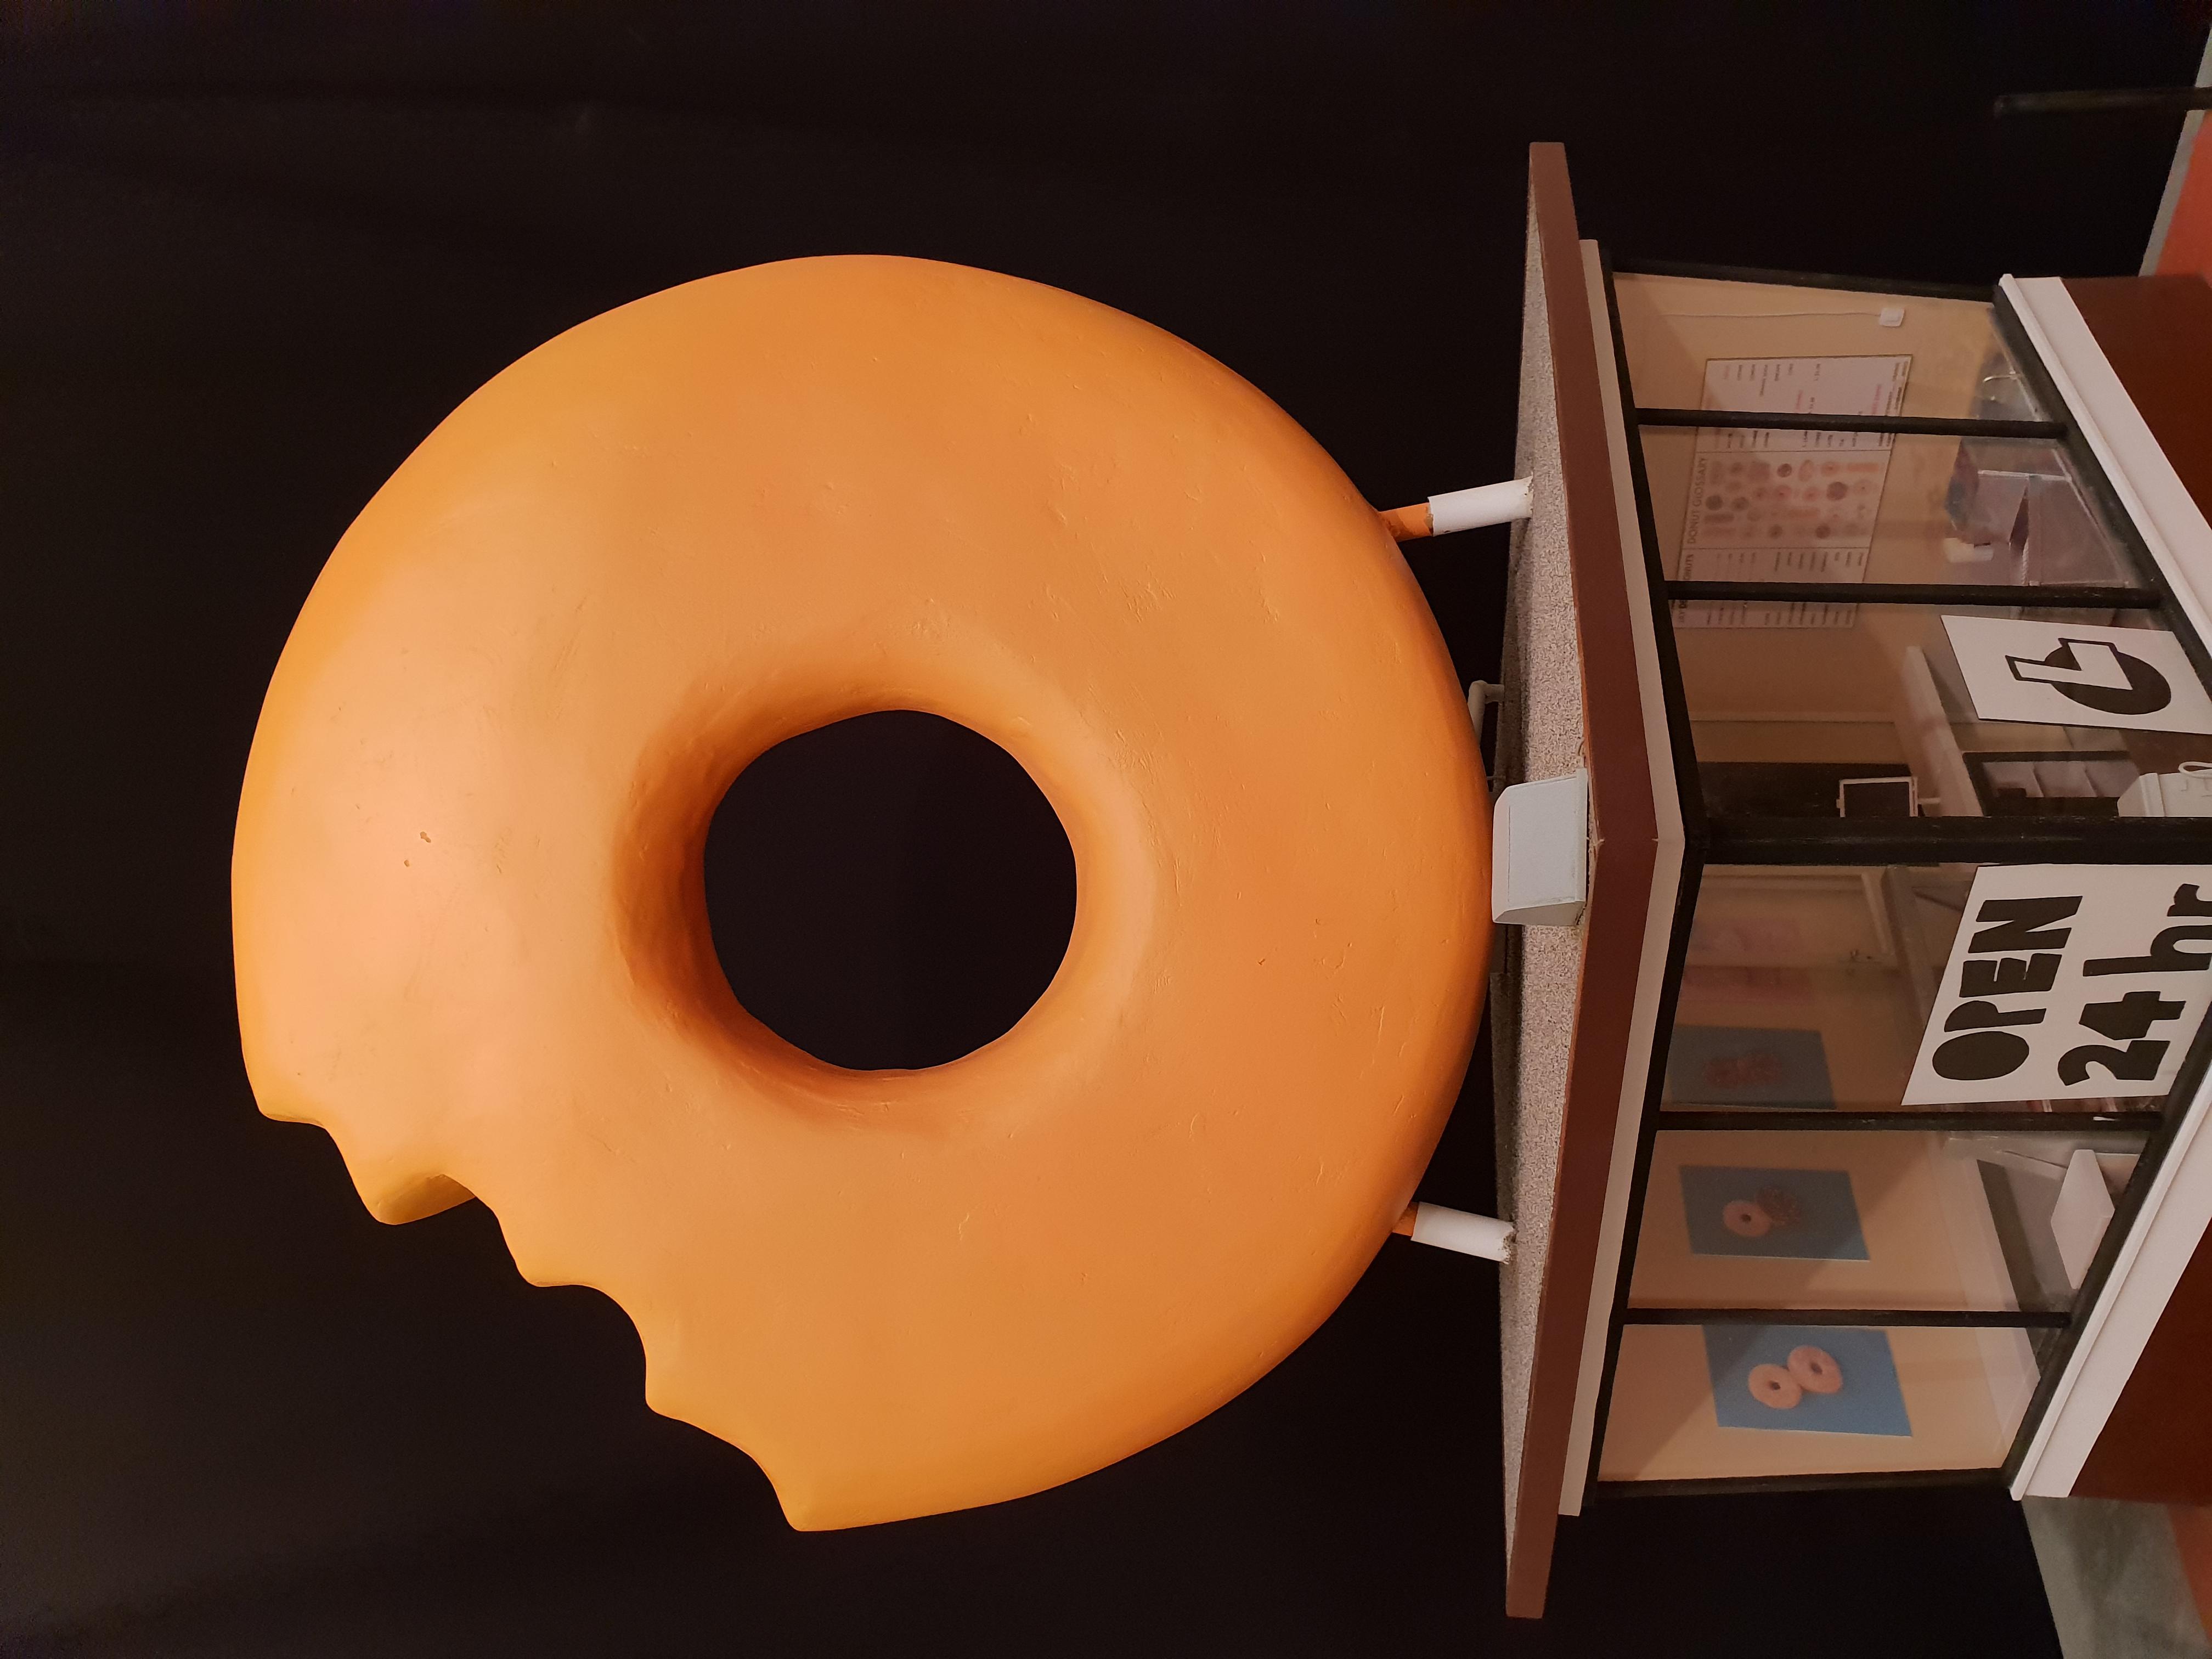 Dilla's Donuts 2019